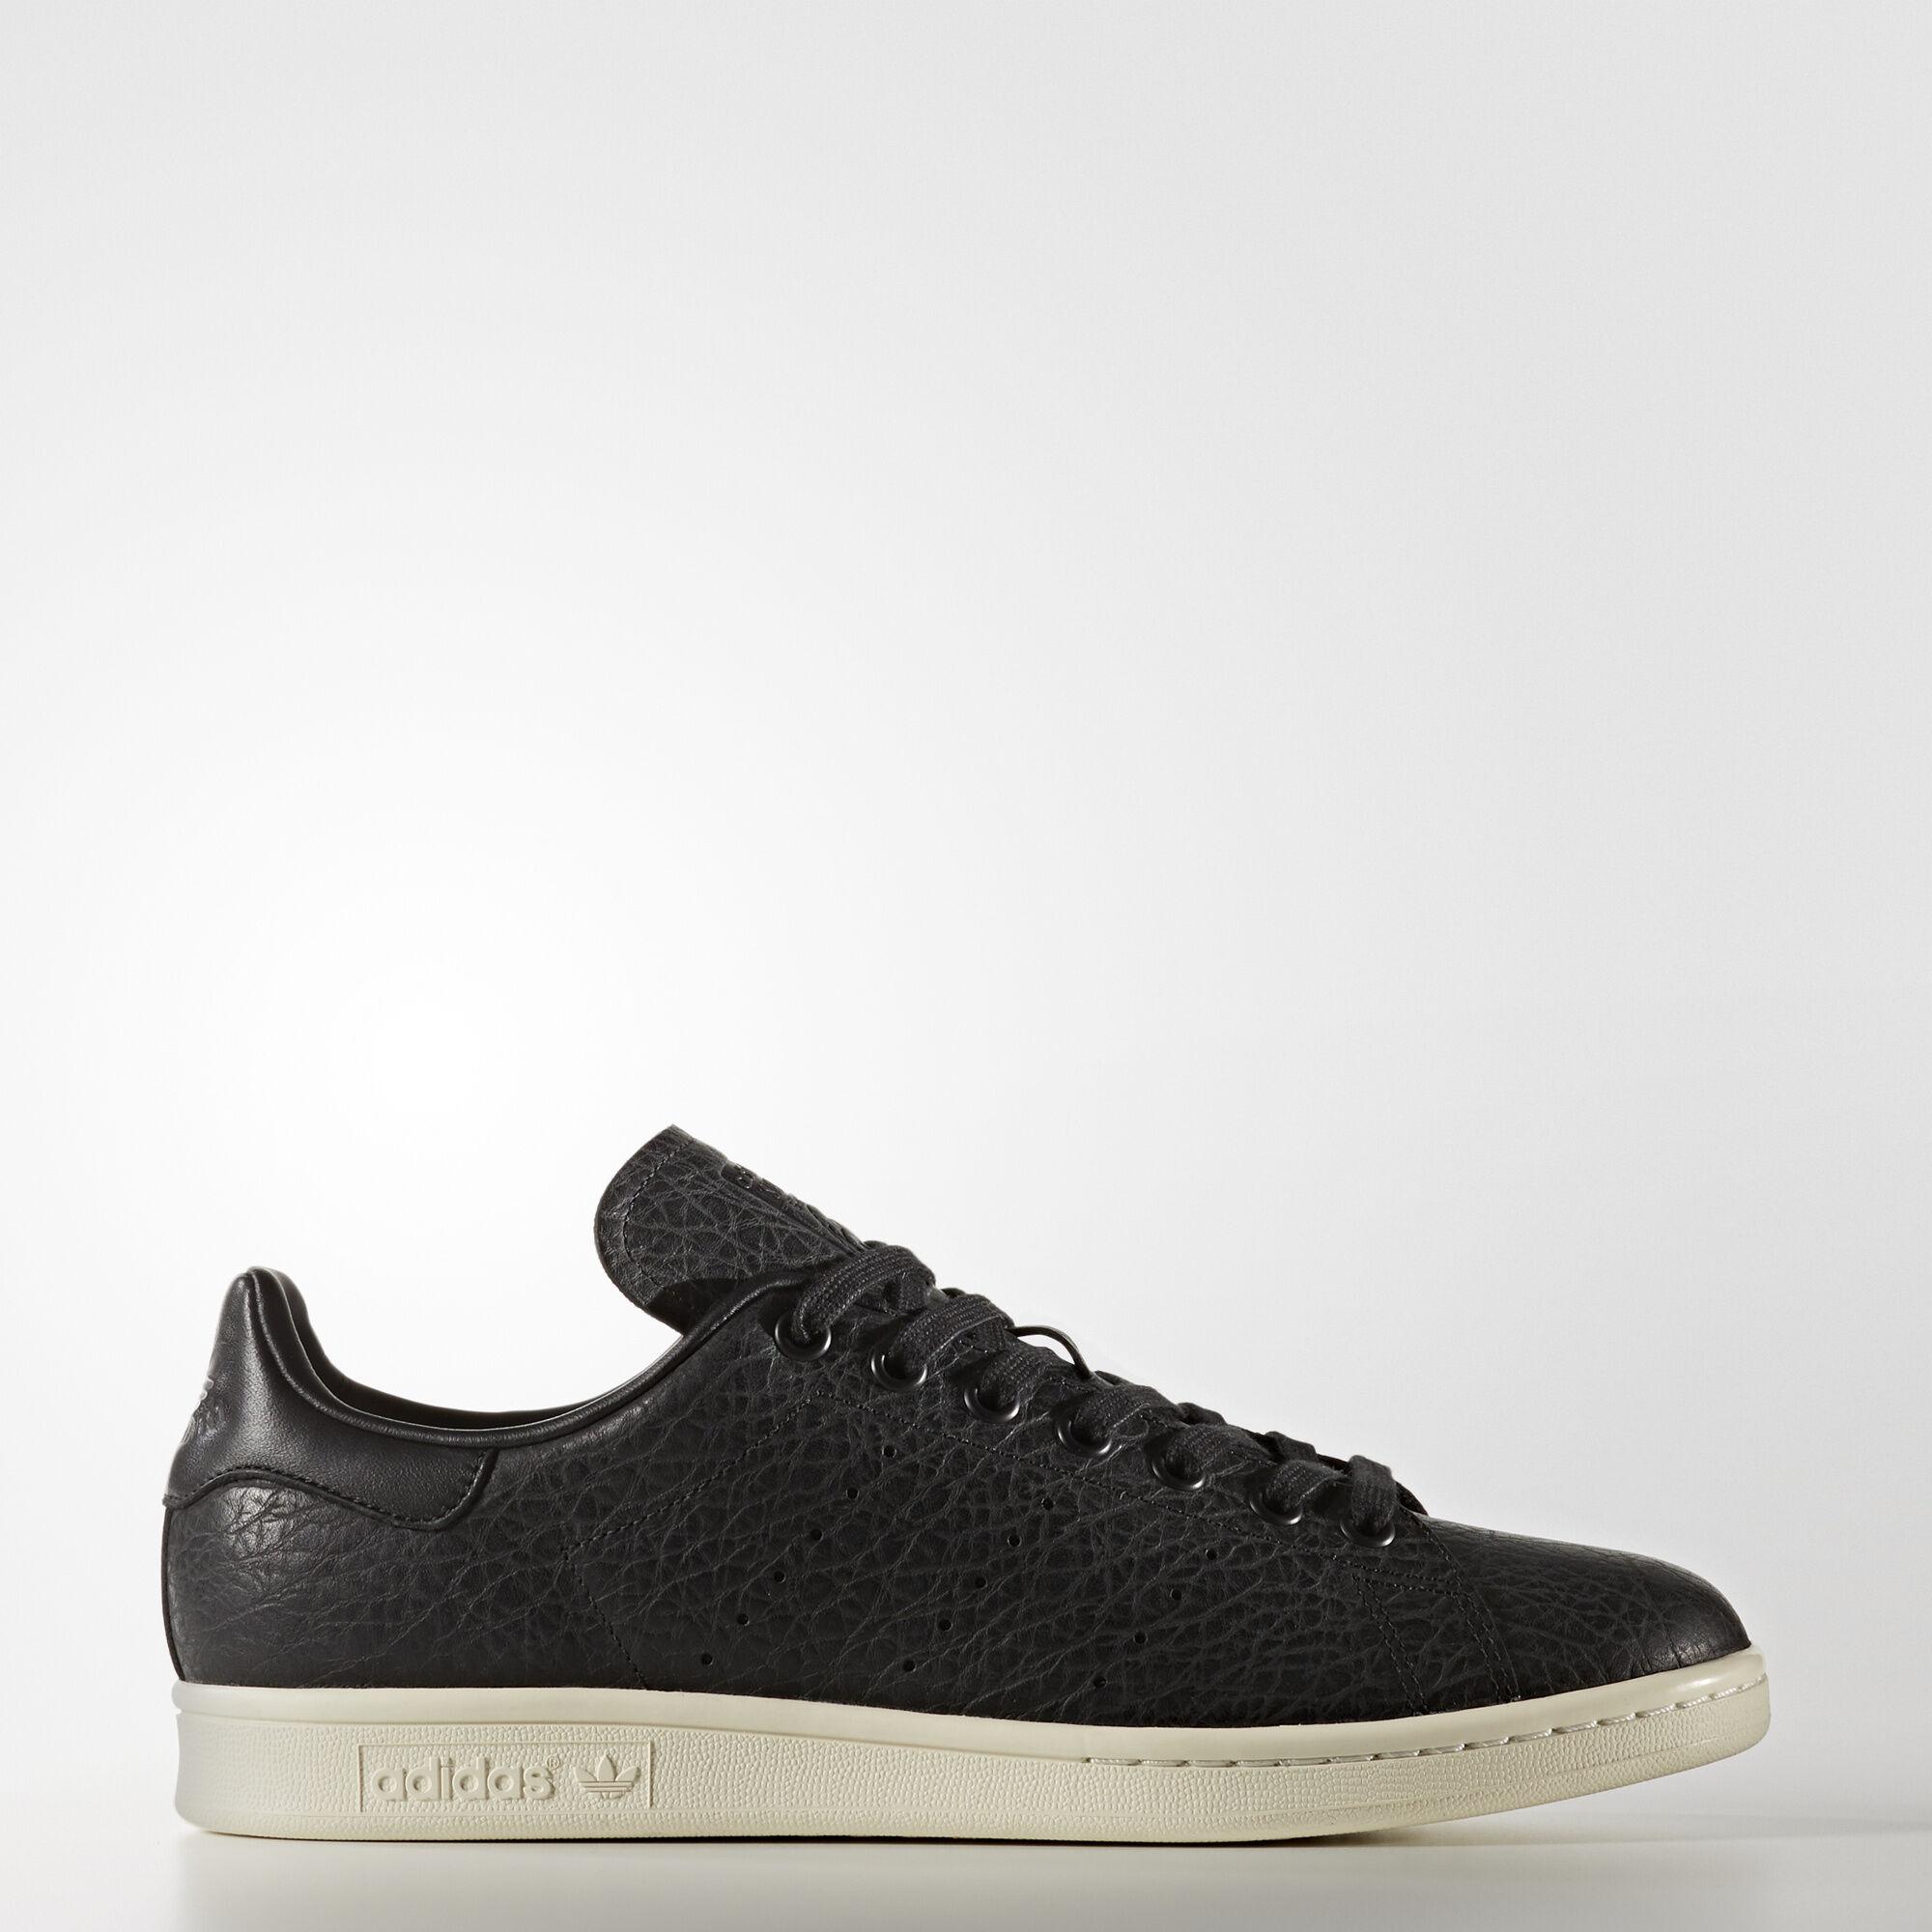 détaillant en ligne e1acd 3702e Adidas Shoes Stan Smith Price herbusinessuk.co.uk